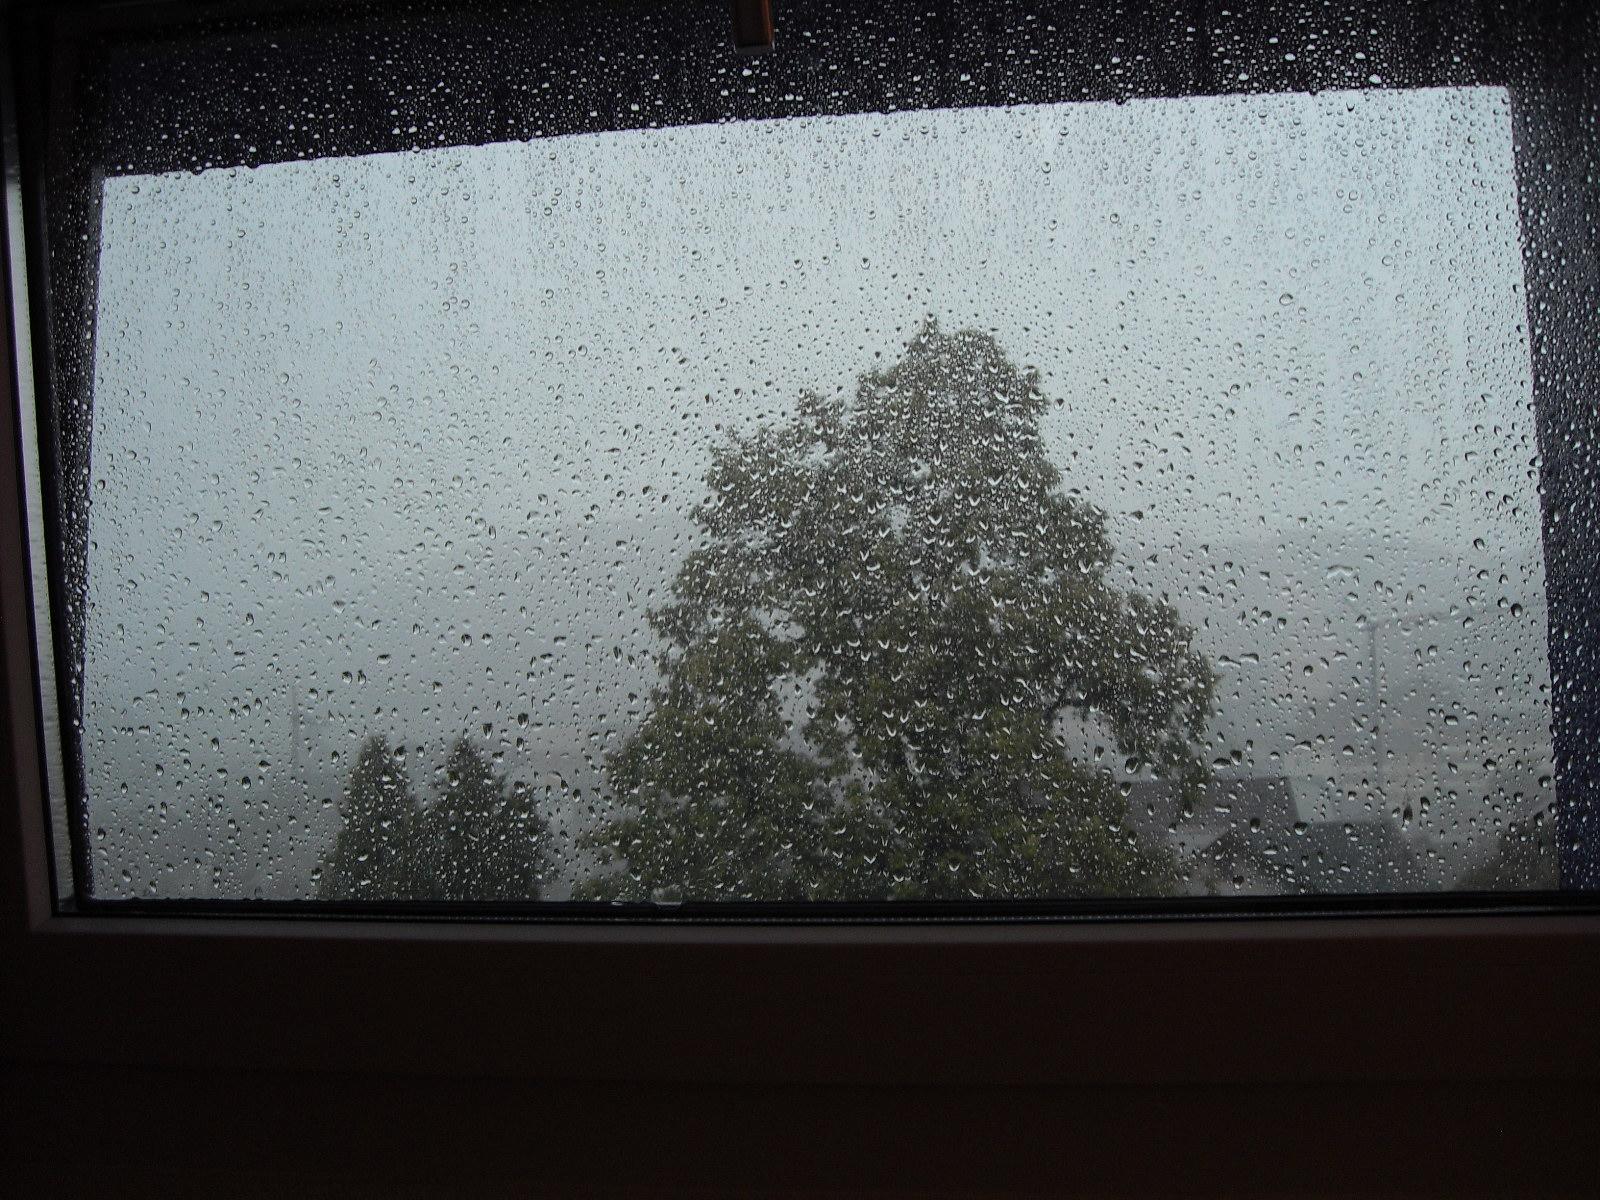 Juli / Willkommener Regen ... 3